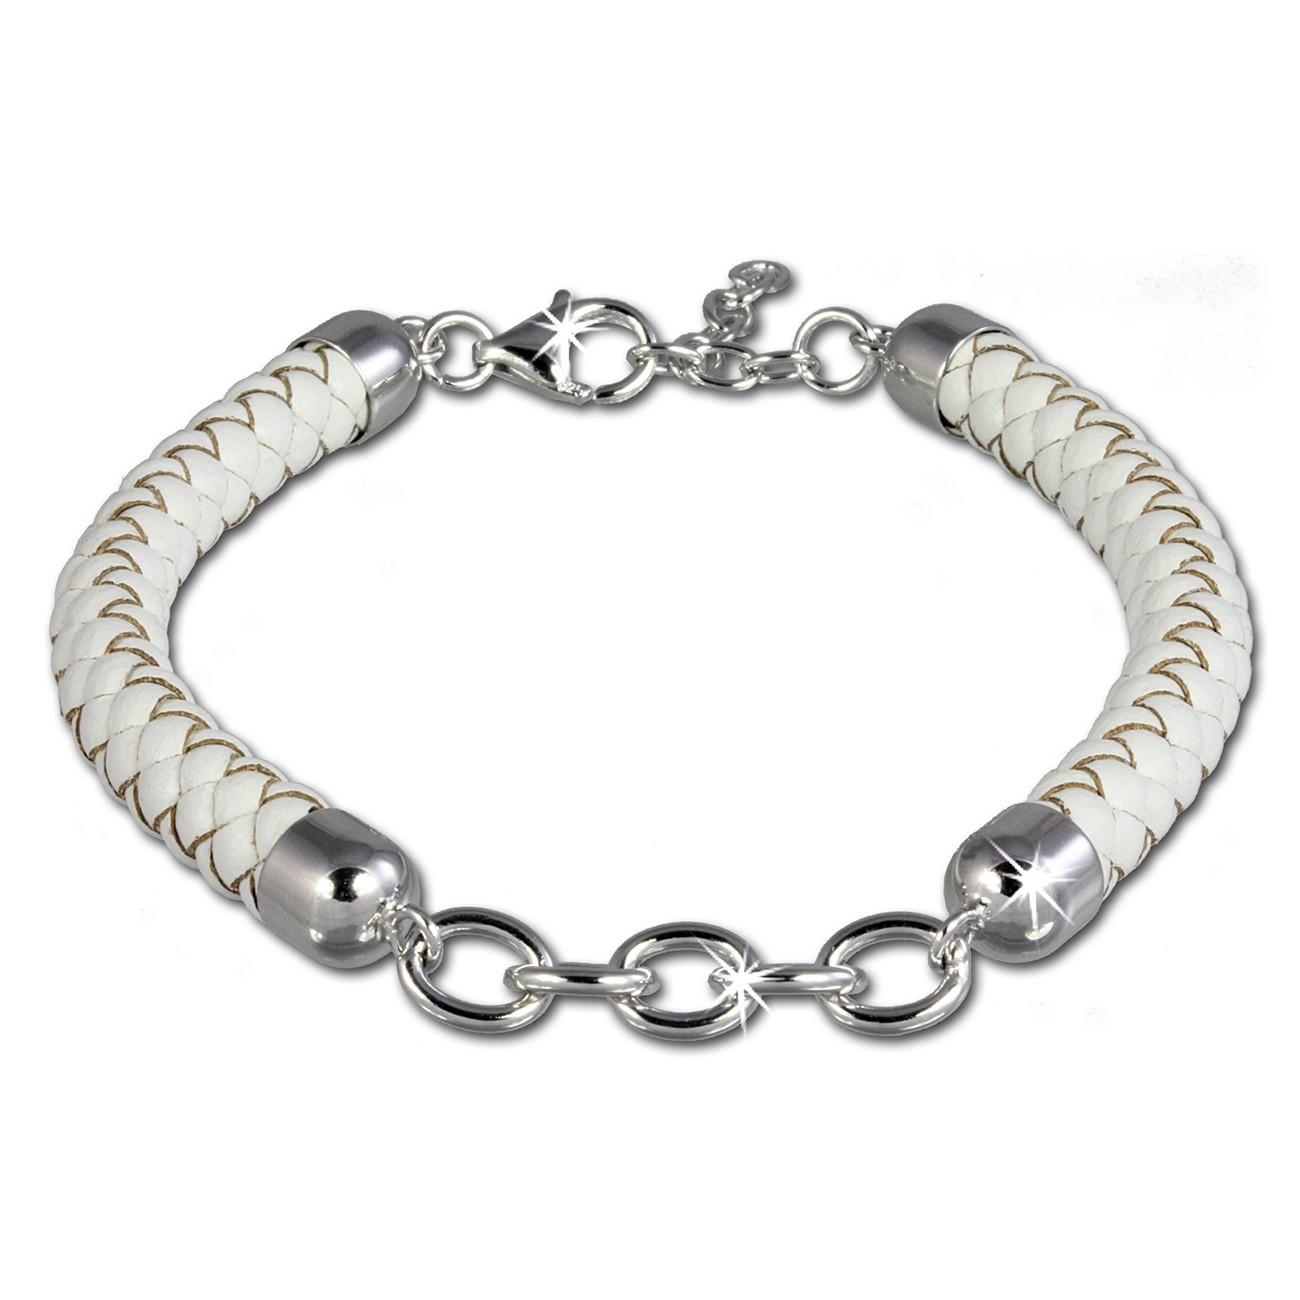 SilberDream Lederarmband weiß für Charms 925er Silber Armband FC0033W